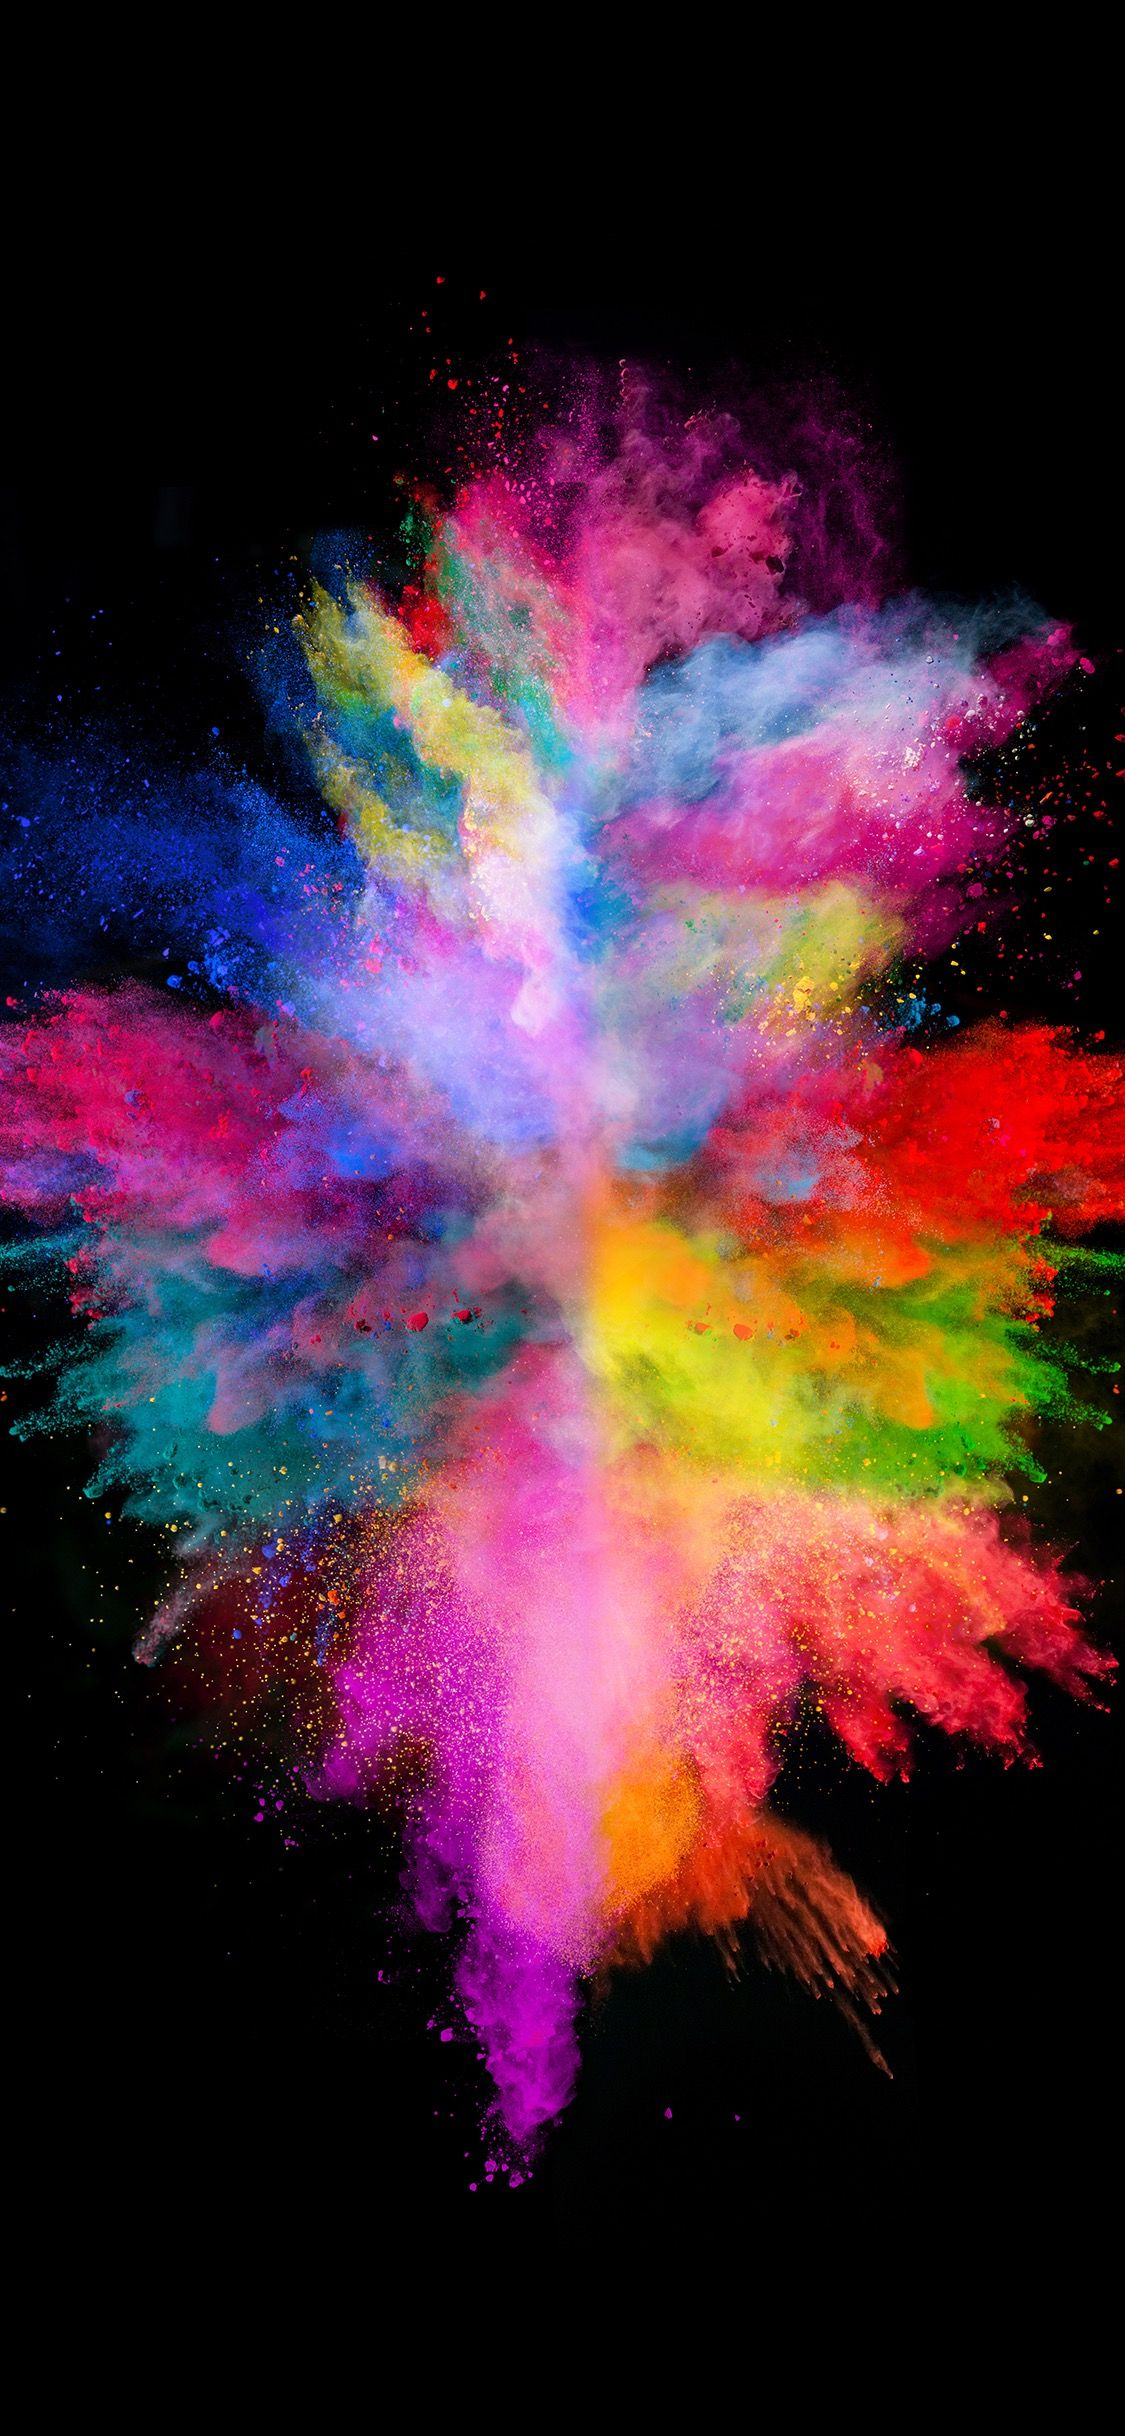 خلفيات ايفون 11 Colourful Wallpaper Iphone Watercolor Wallpaper Iphone Iphone Wallpaper Glitter